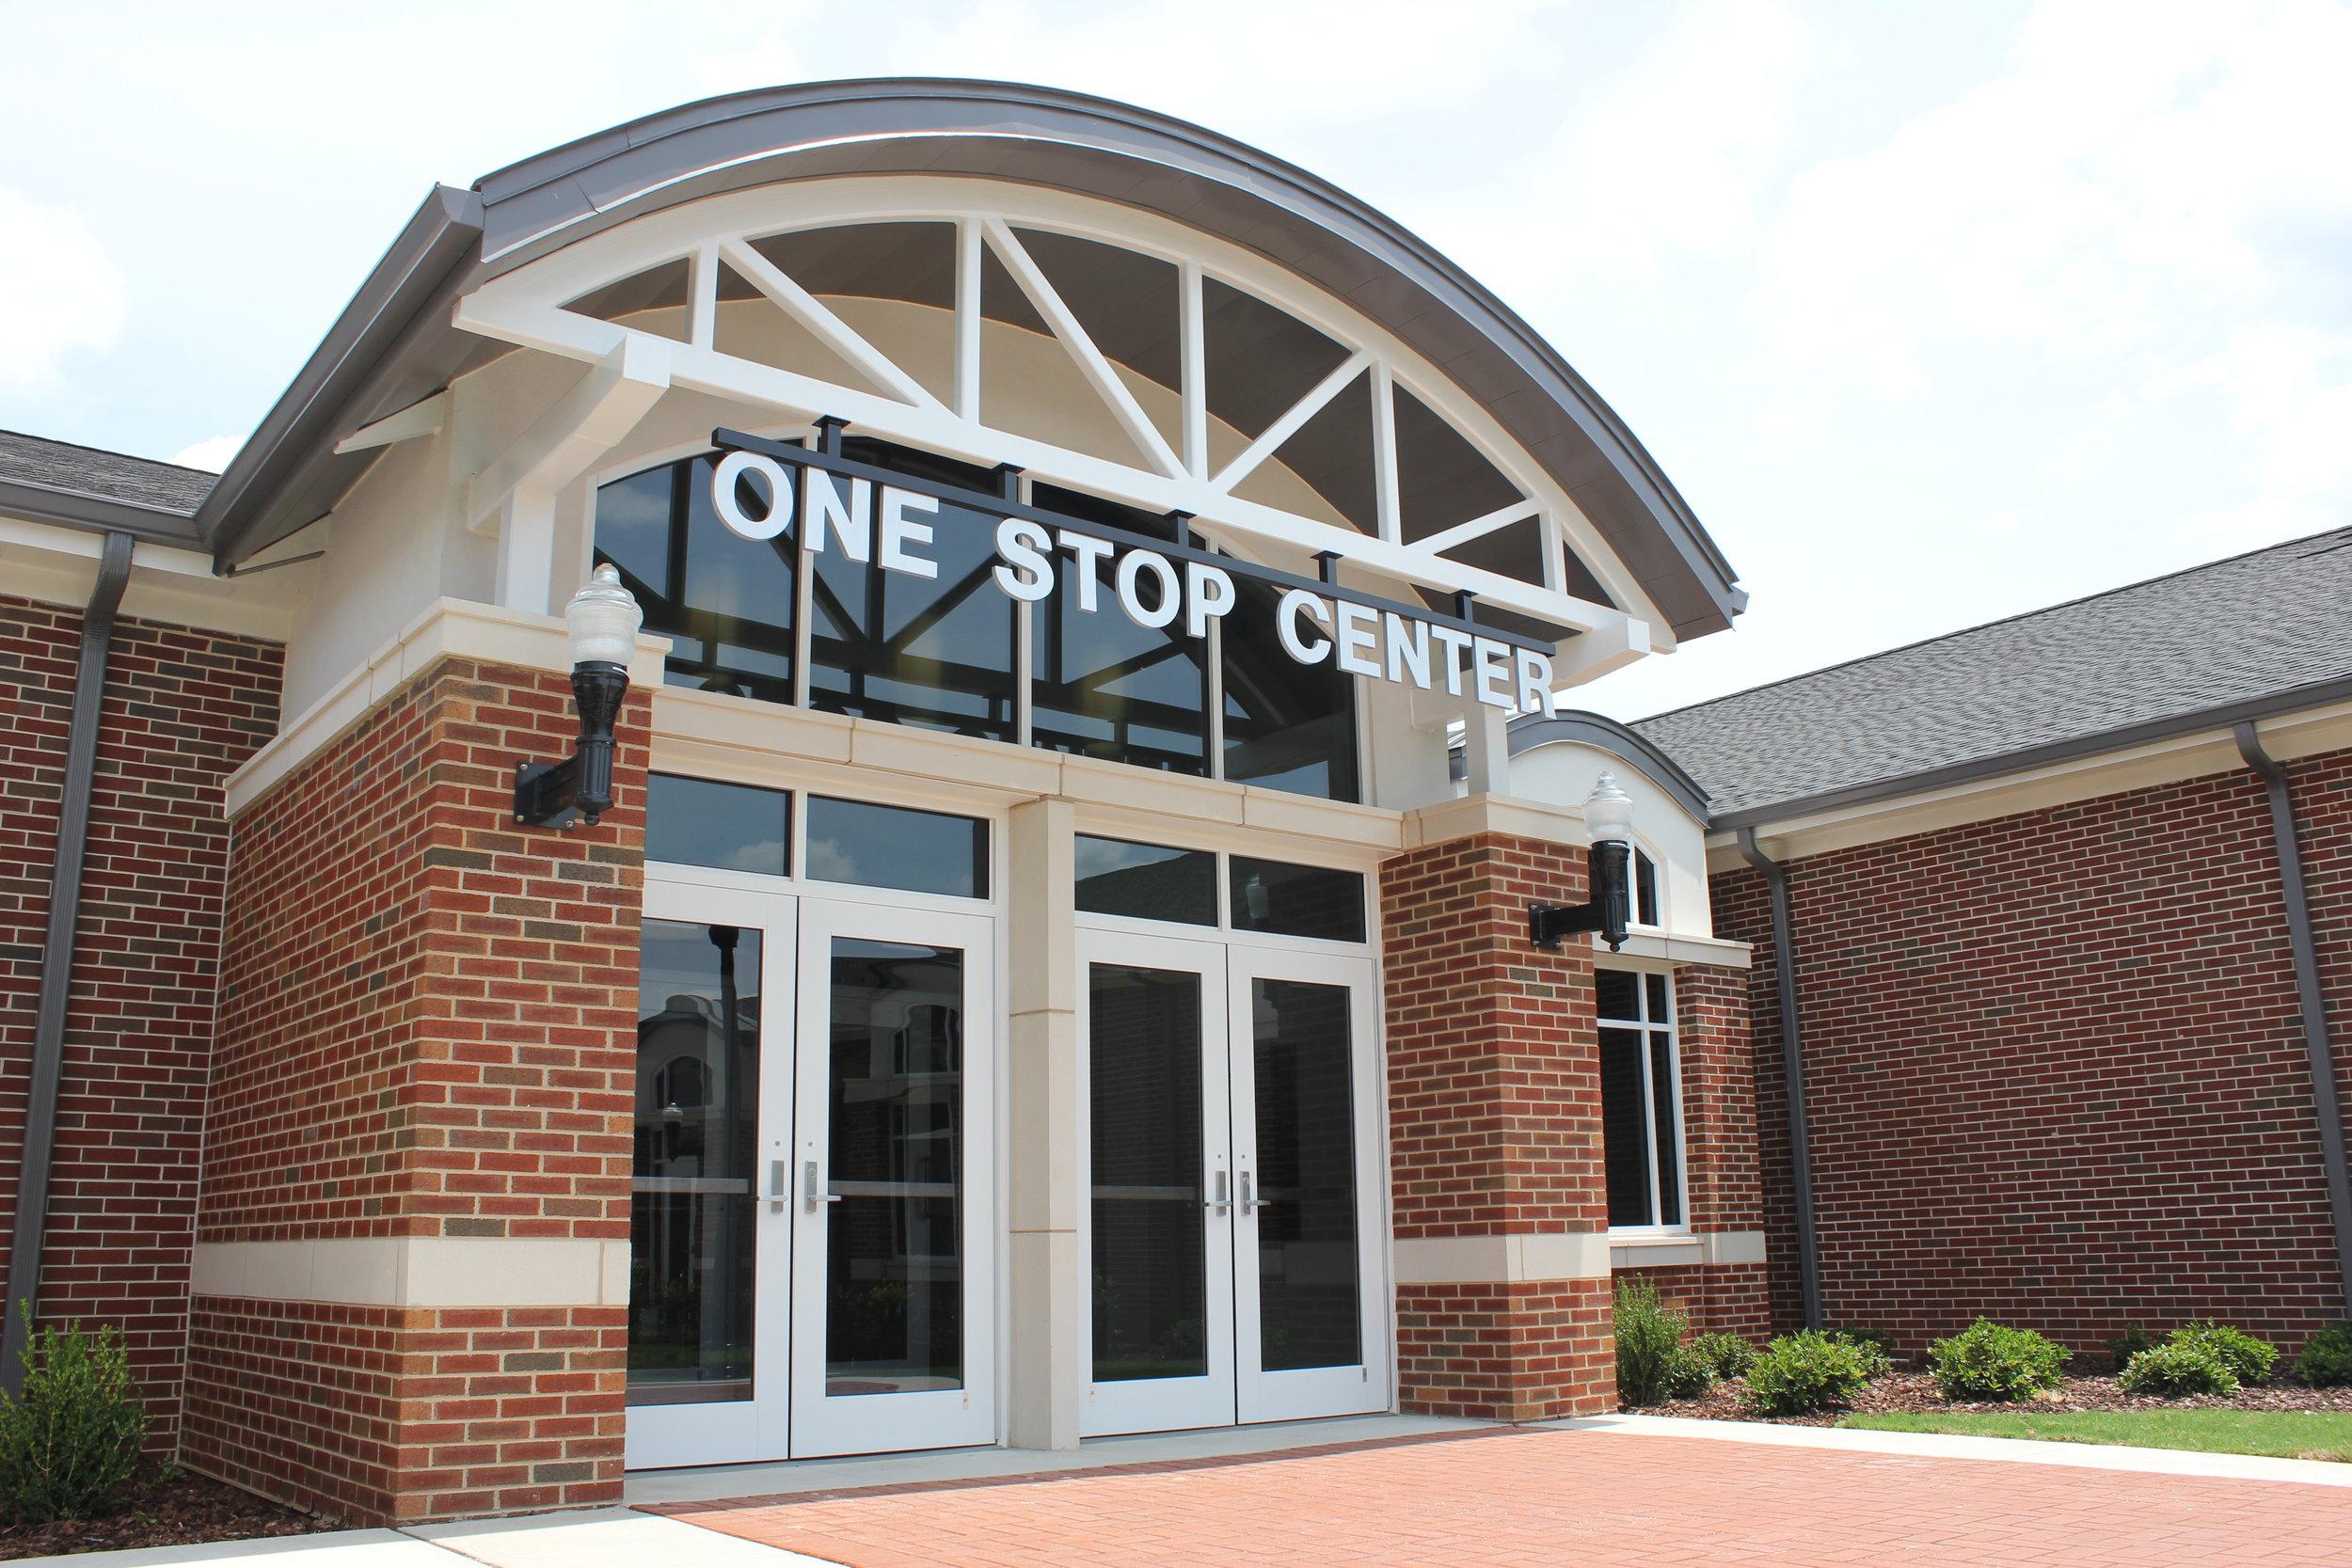 Gadsden State One Stop Center_Photo_Entrance_4.JPG